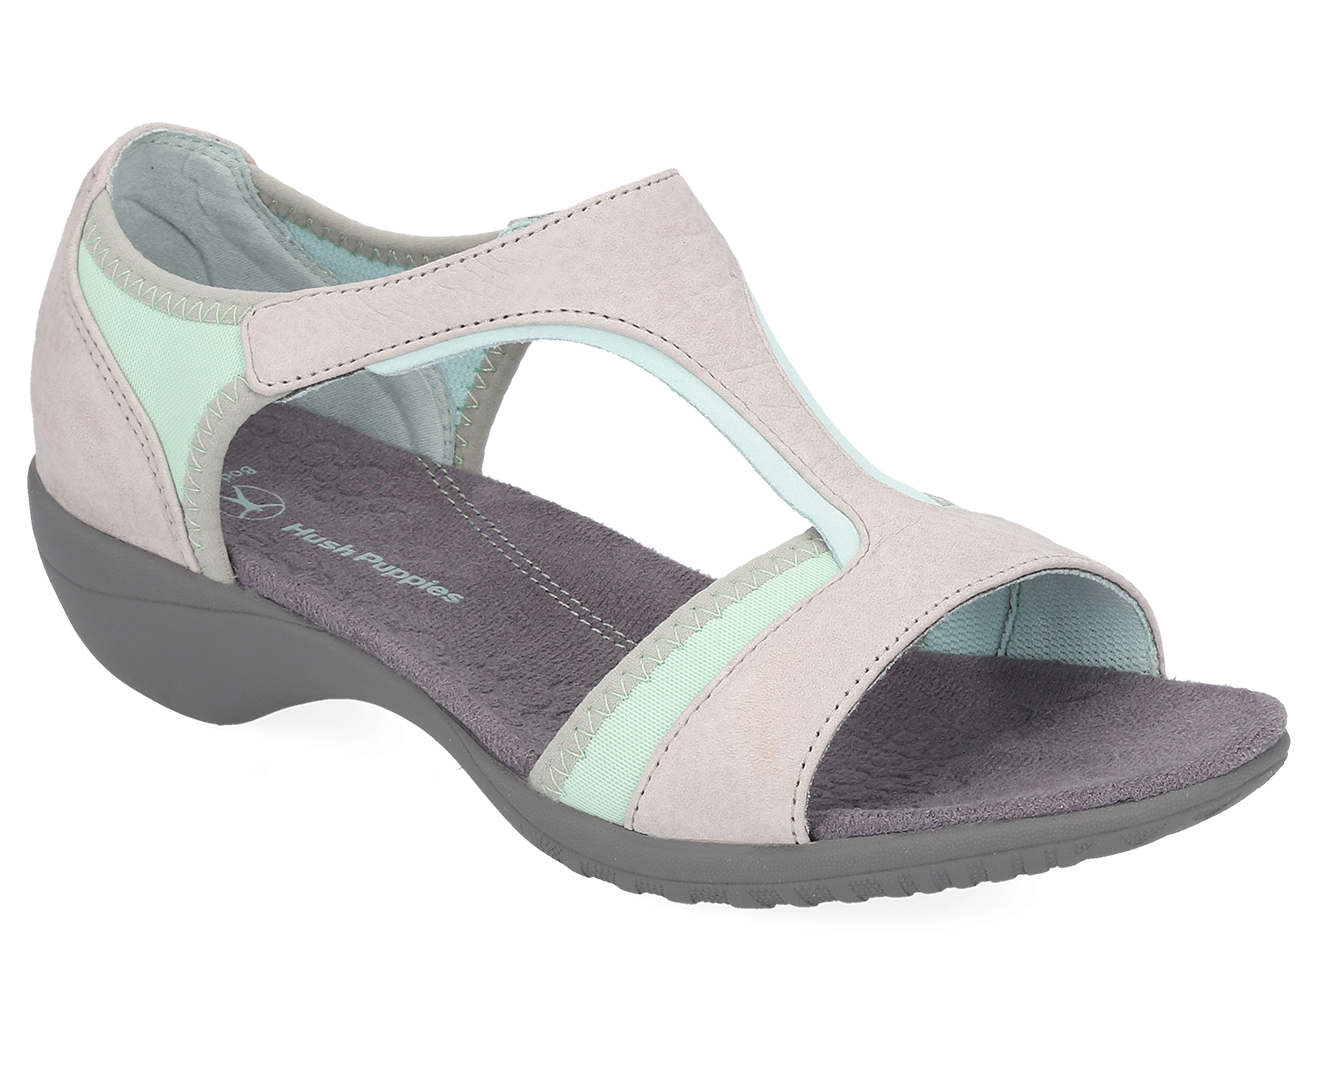 Details about Hush Puppies Women's Meditate Heel Sandal Cool Grey